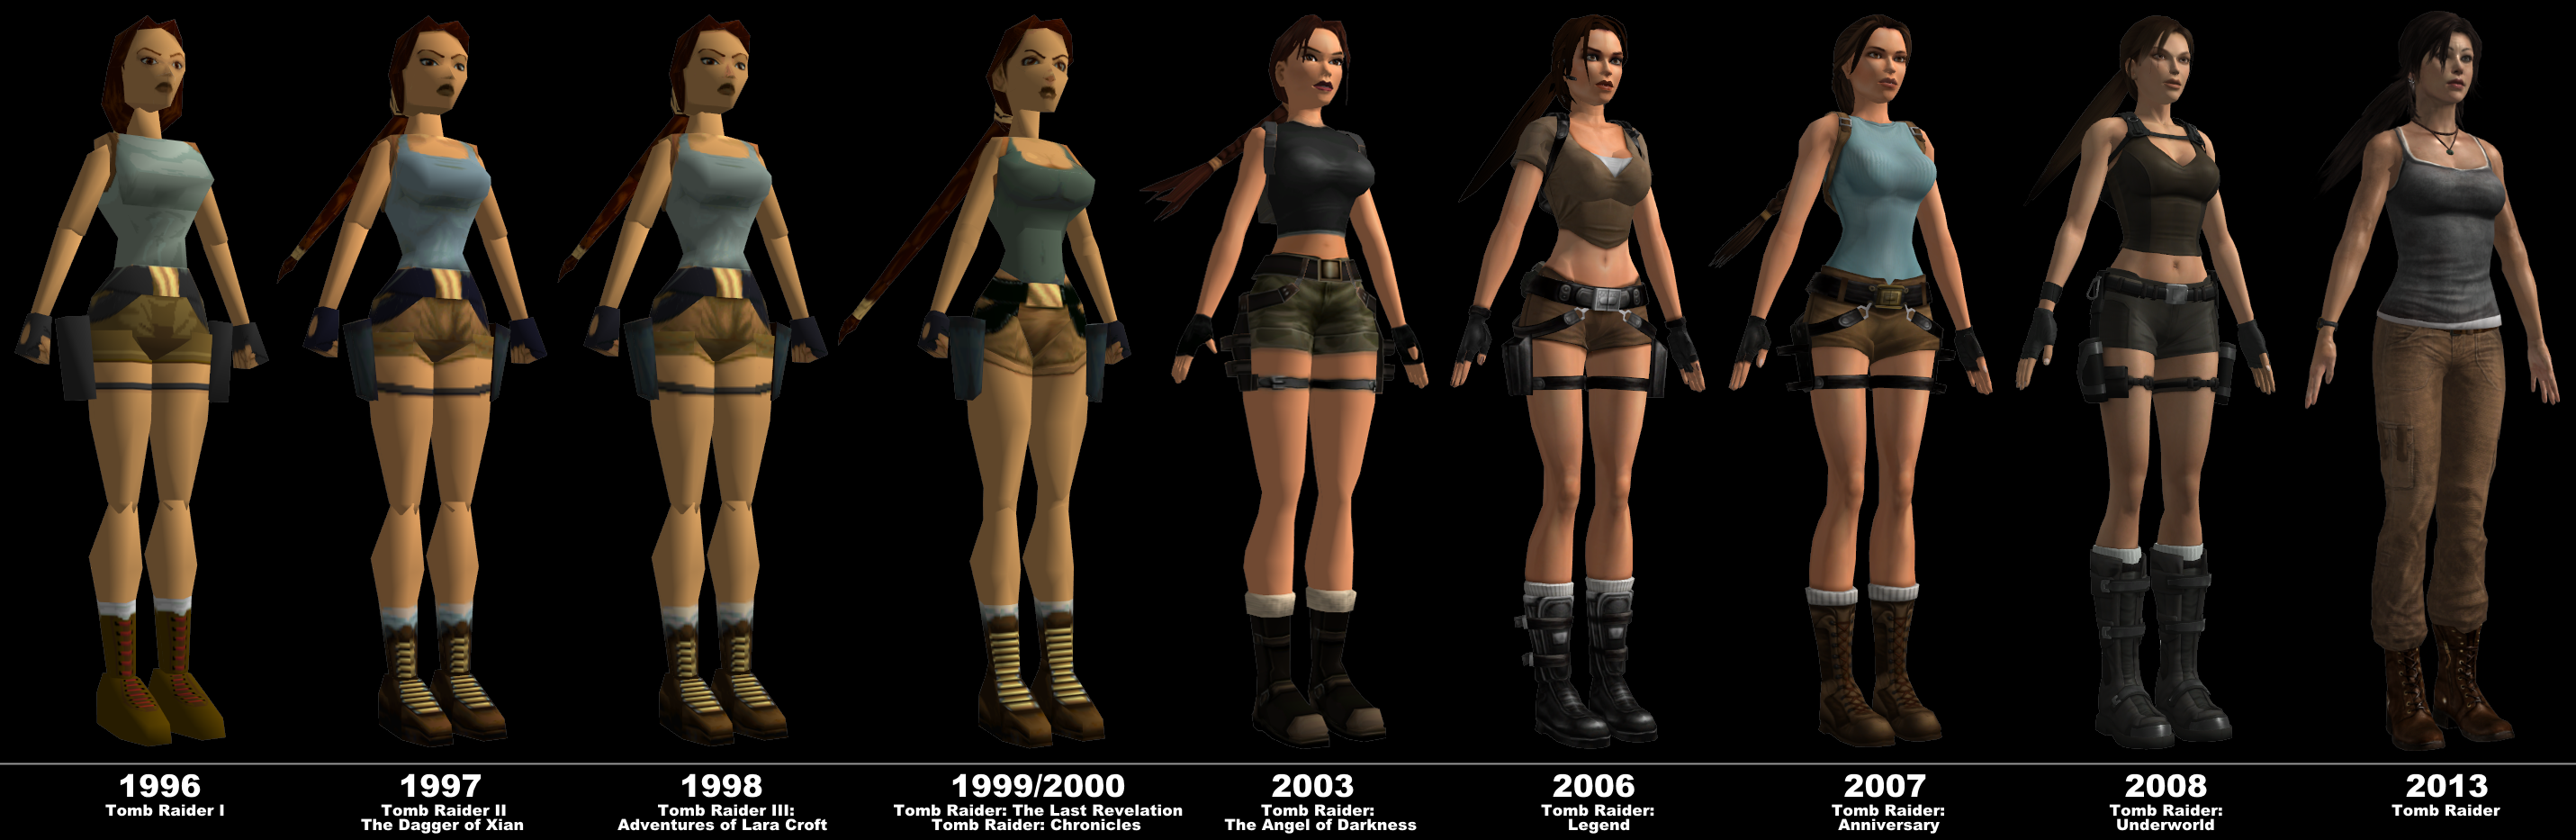 https://upload.wikimedia.org/wikipedia/ru/a/a2/Tomb_Raider_Evolution_Chart.png